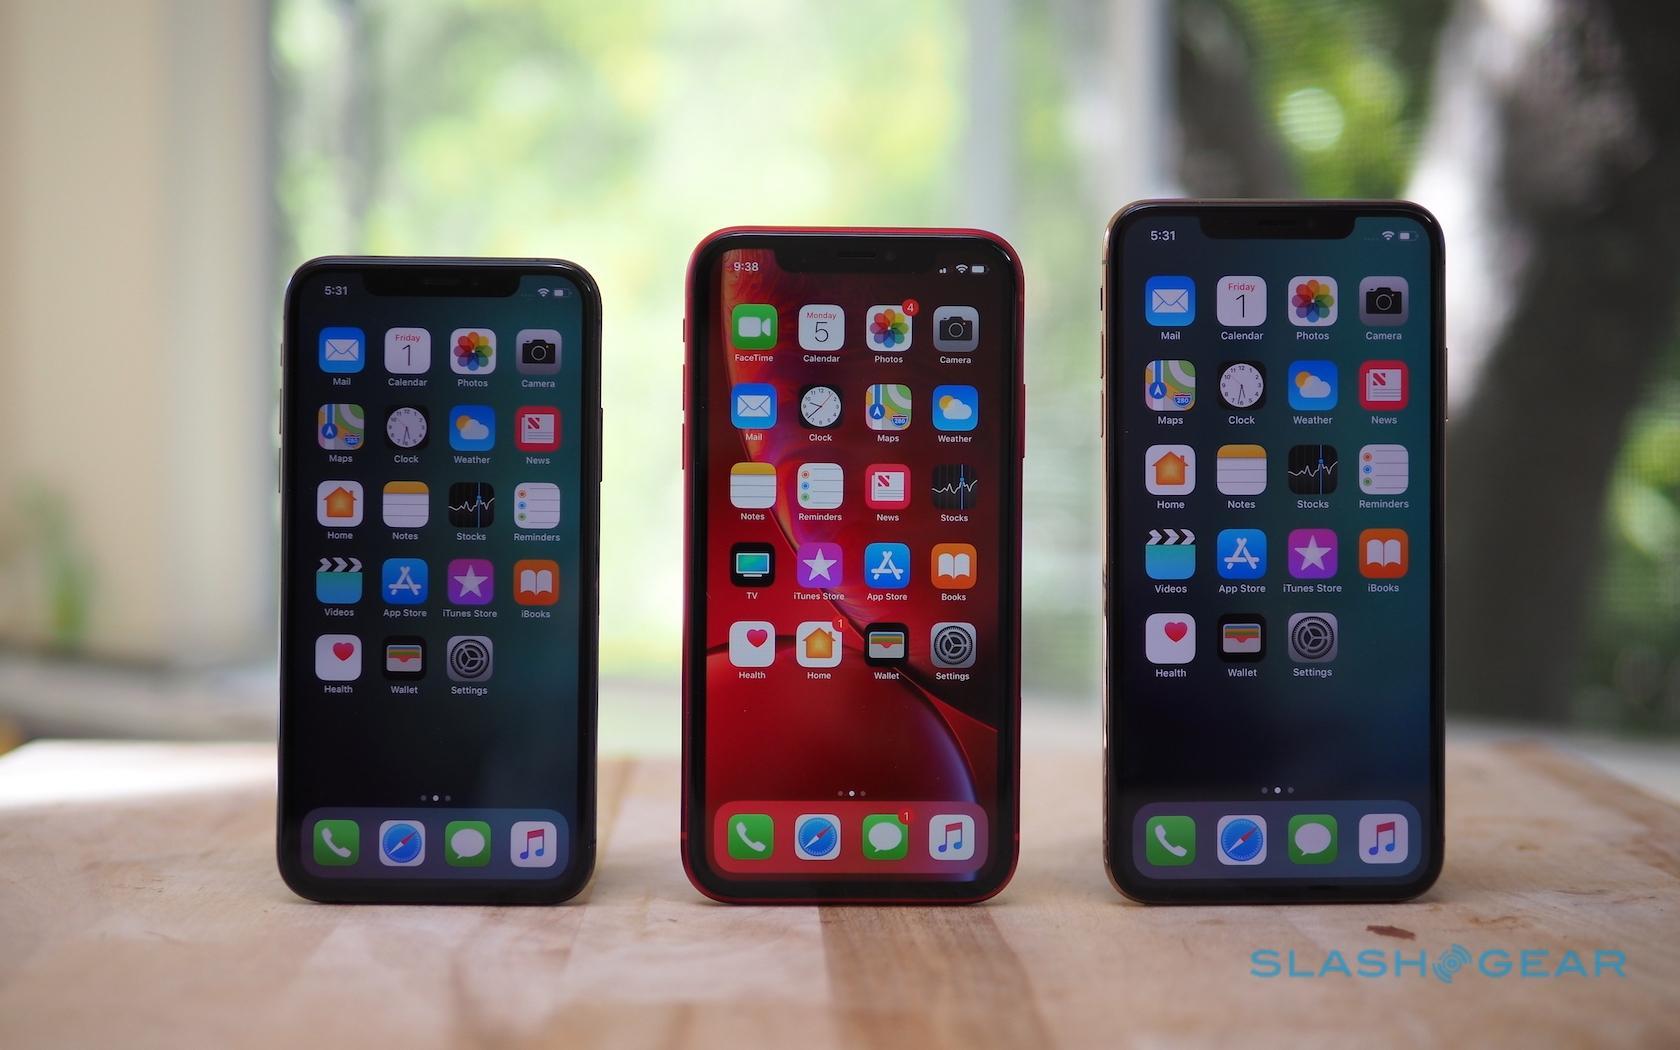 iPhone XR 2, 2019 reboot details leak Apple's latest budget